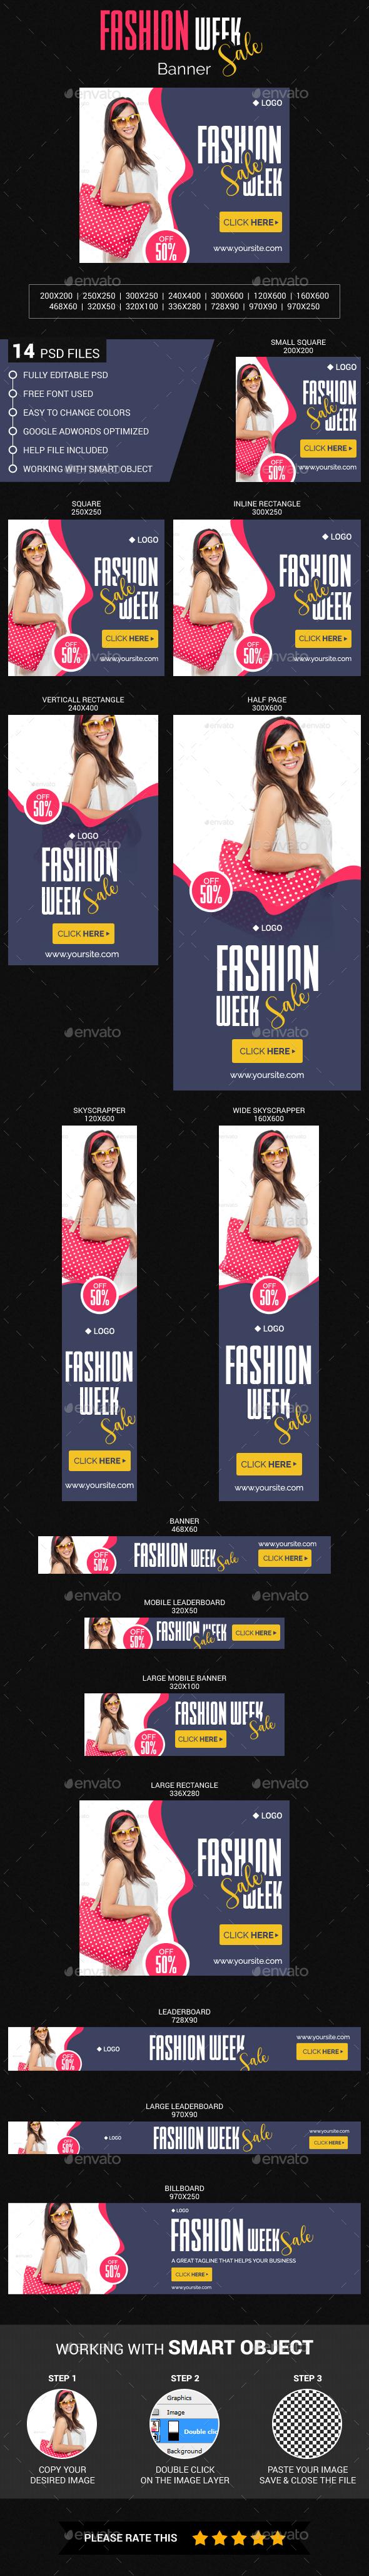 Fashion Week Sale